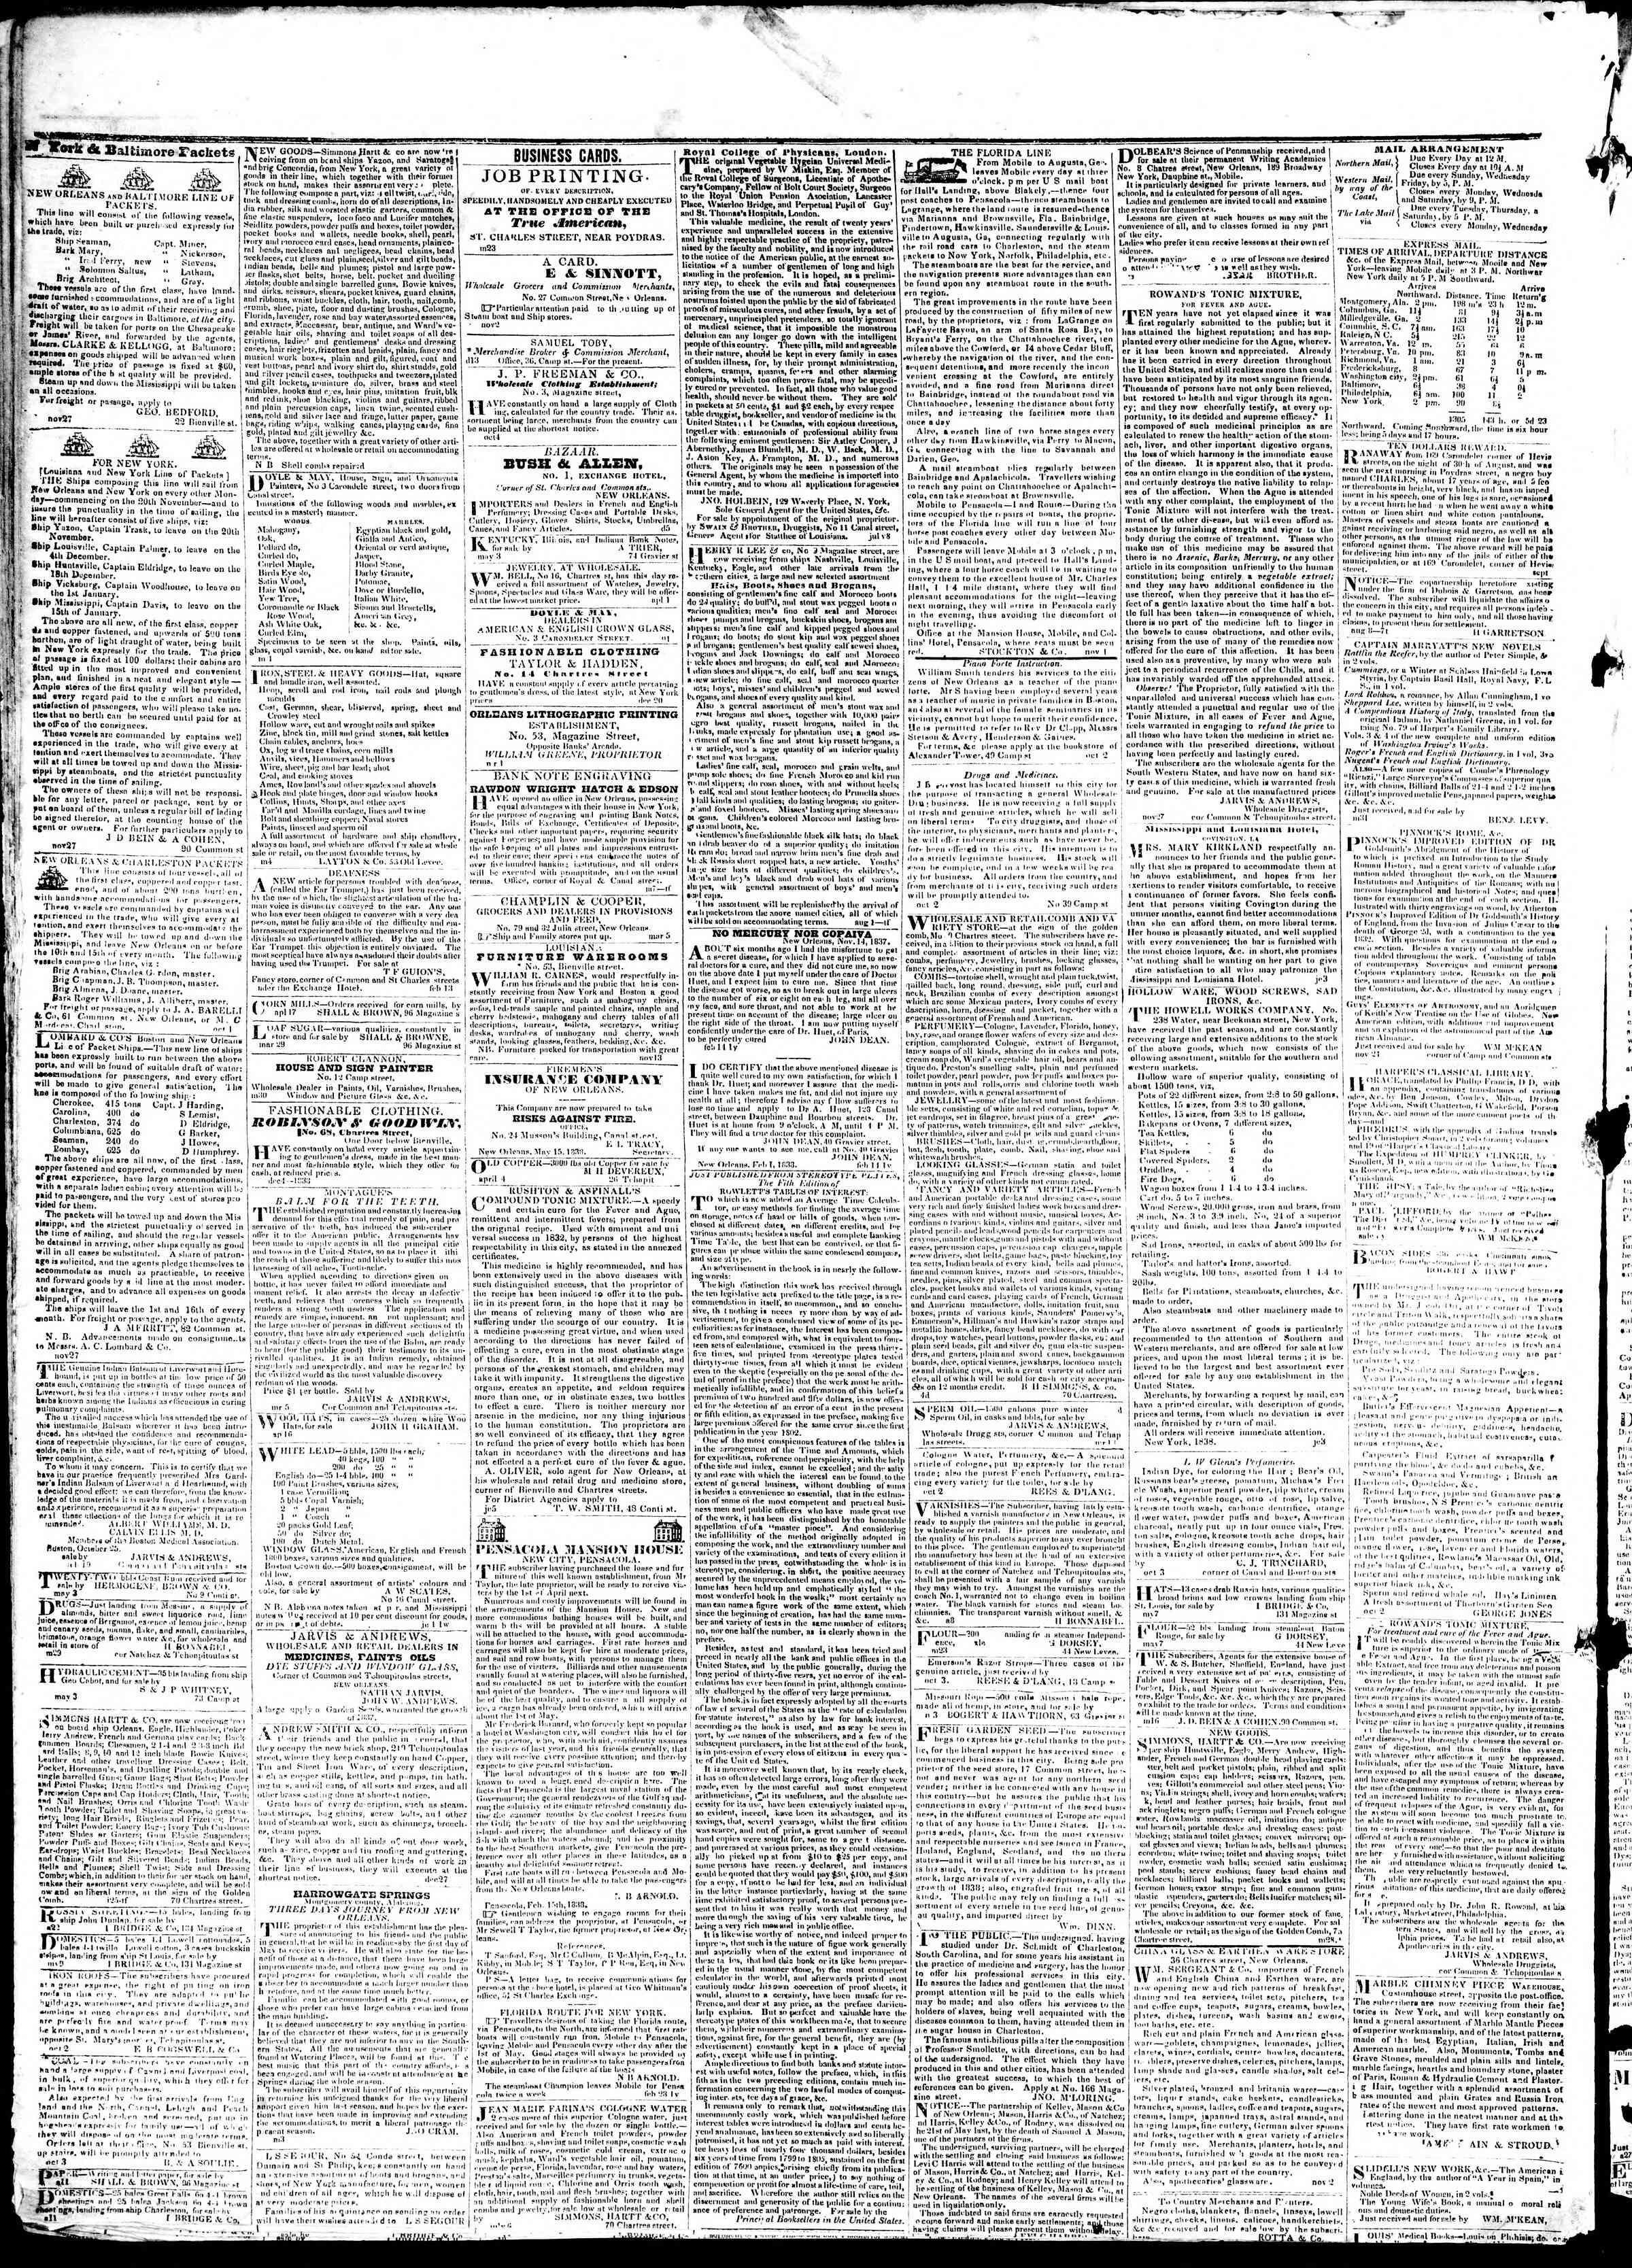 June 25, 1839 Tarihli True American Gazetesi Sayfa 4